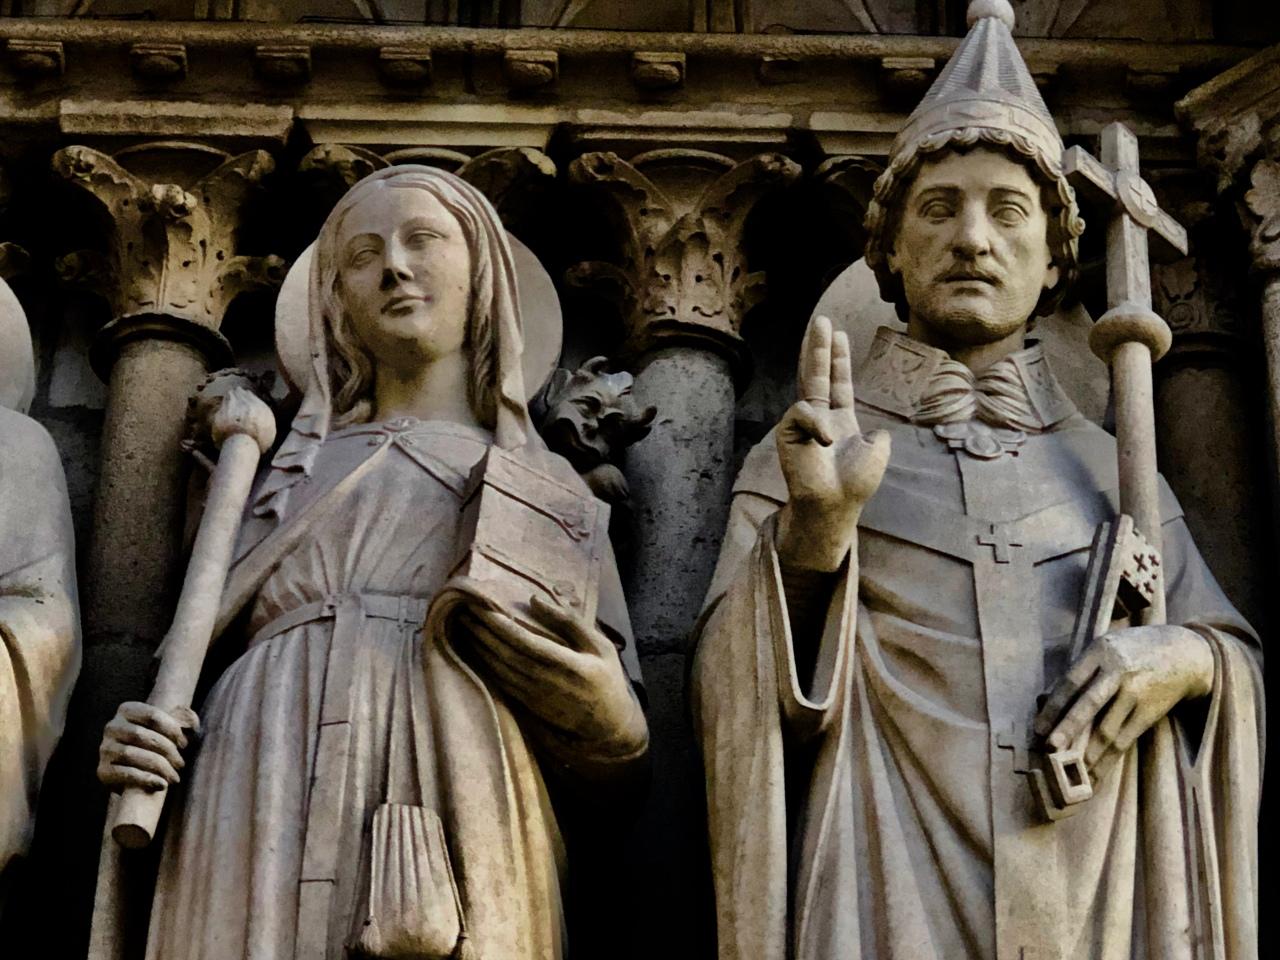 Notre Dame inParis